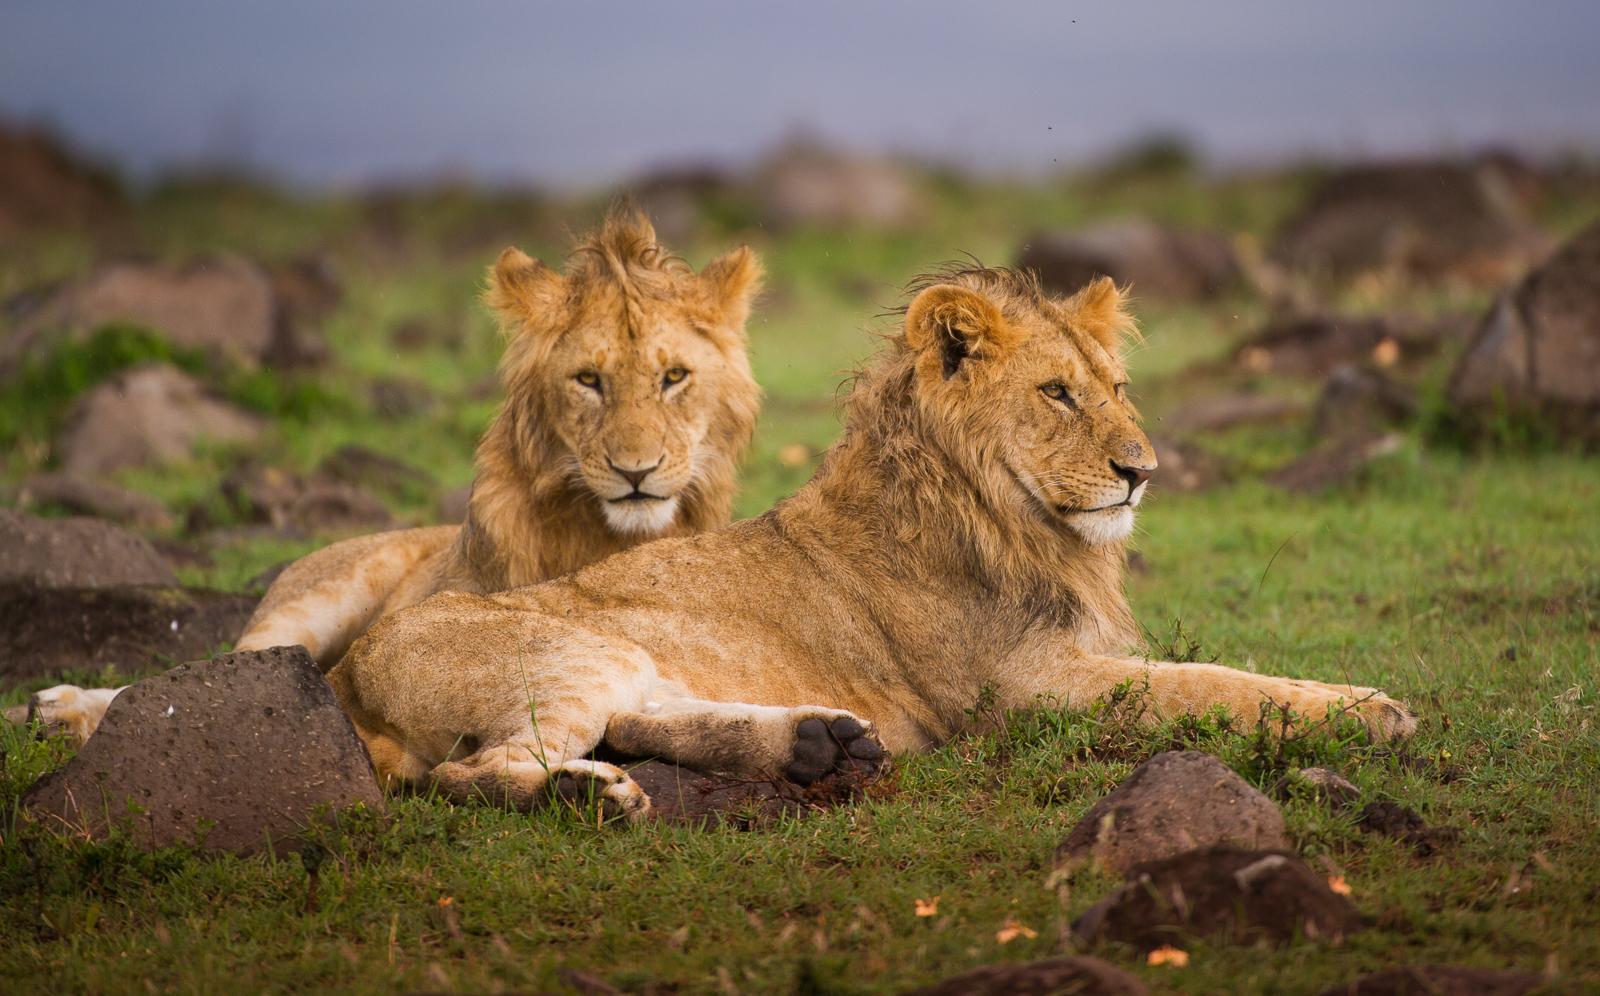 Lions, Maasai Mara National Reserve, Kenya